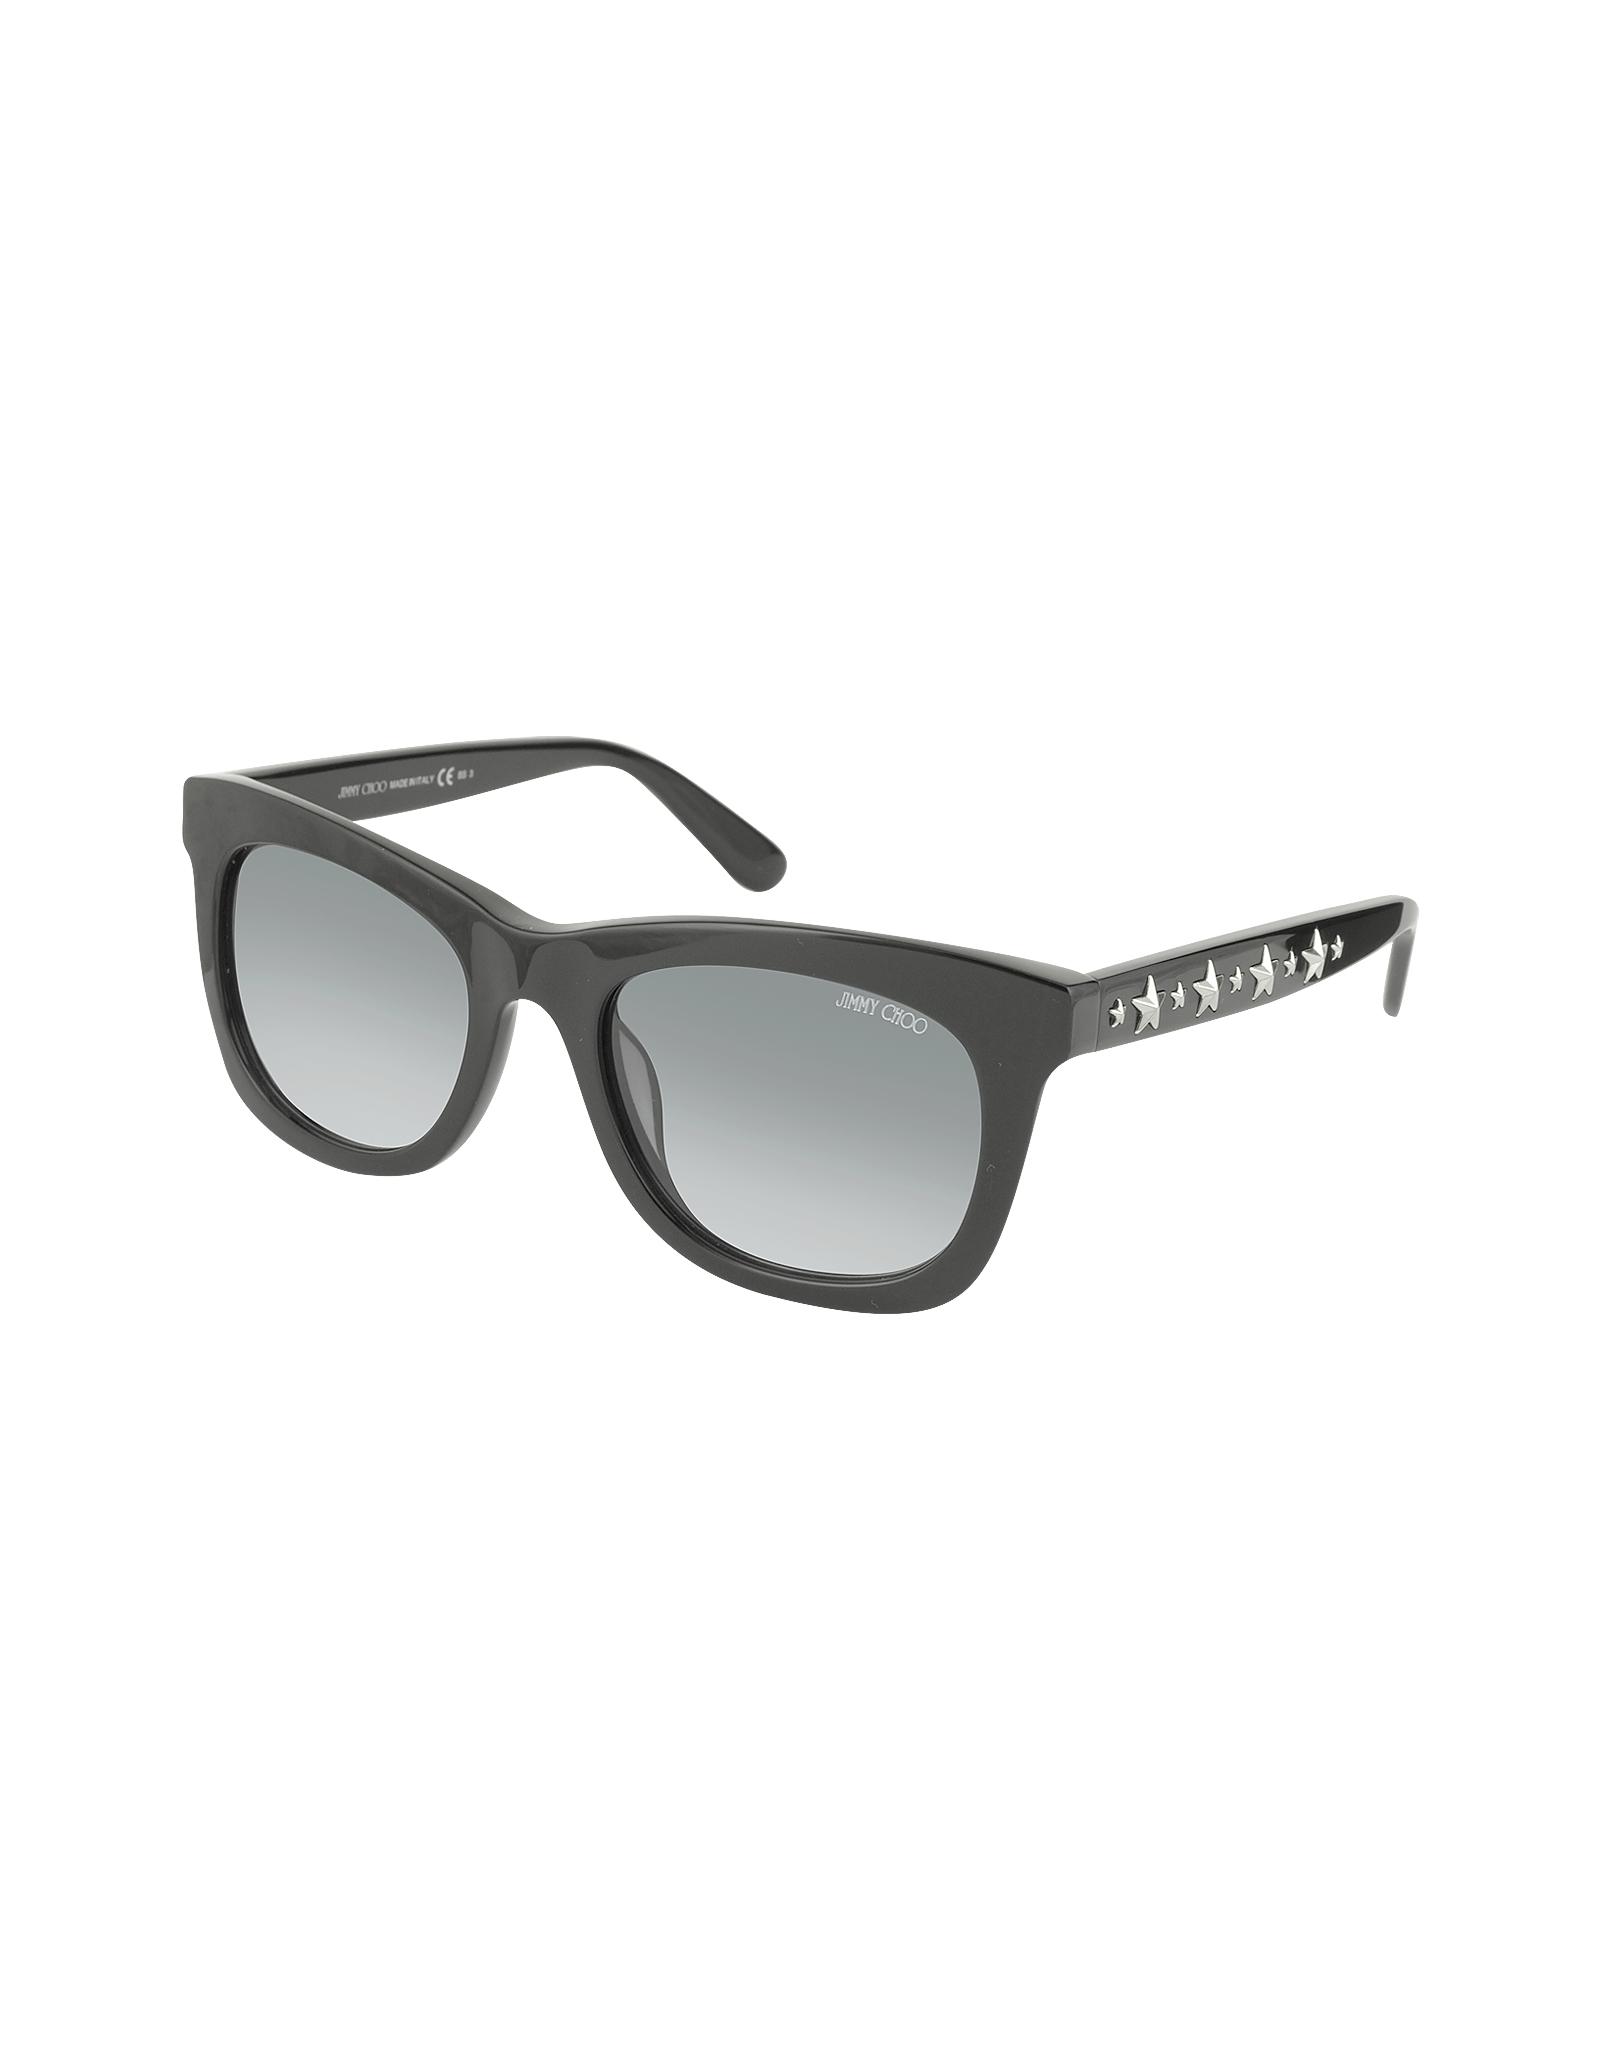 db82c2f1898 Jimmy Choo Sasha S 807Hd Black Square Frame Sunglasses With Silver ...